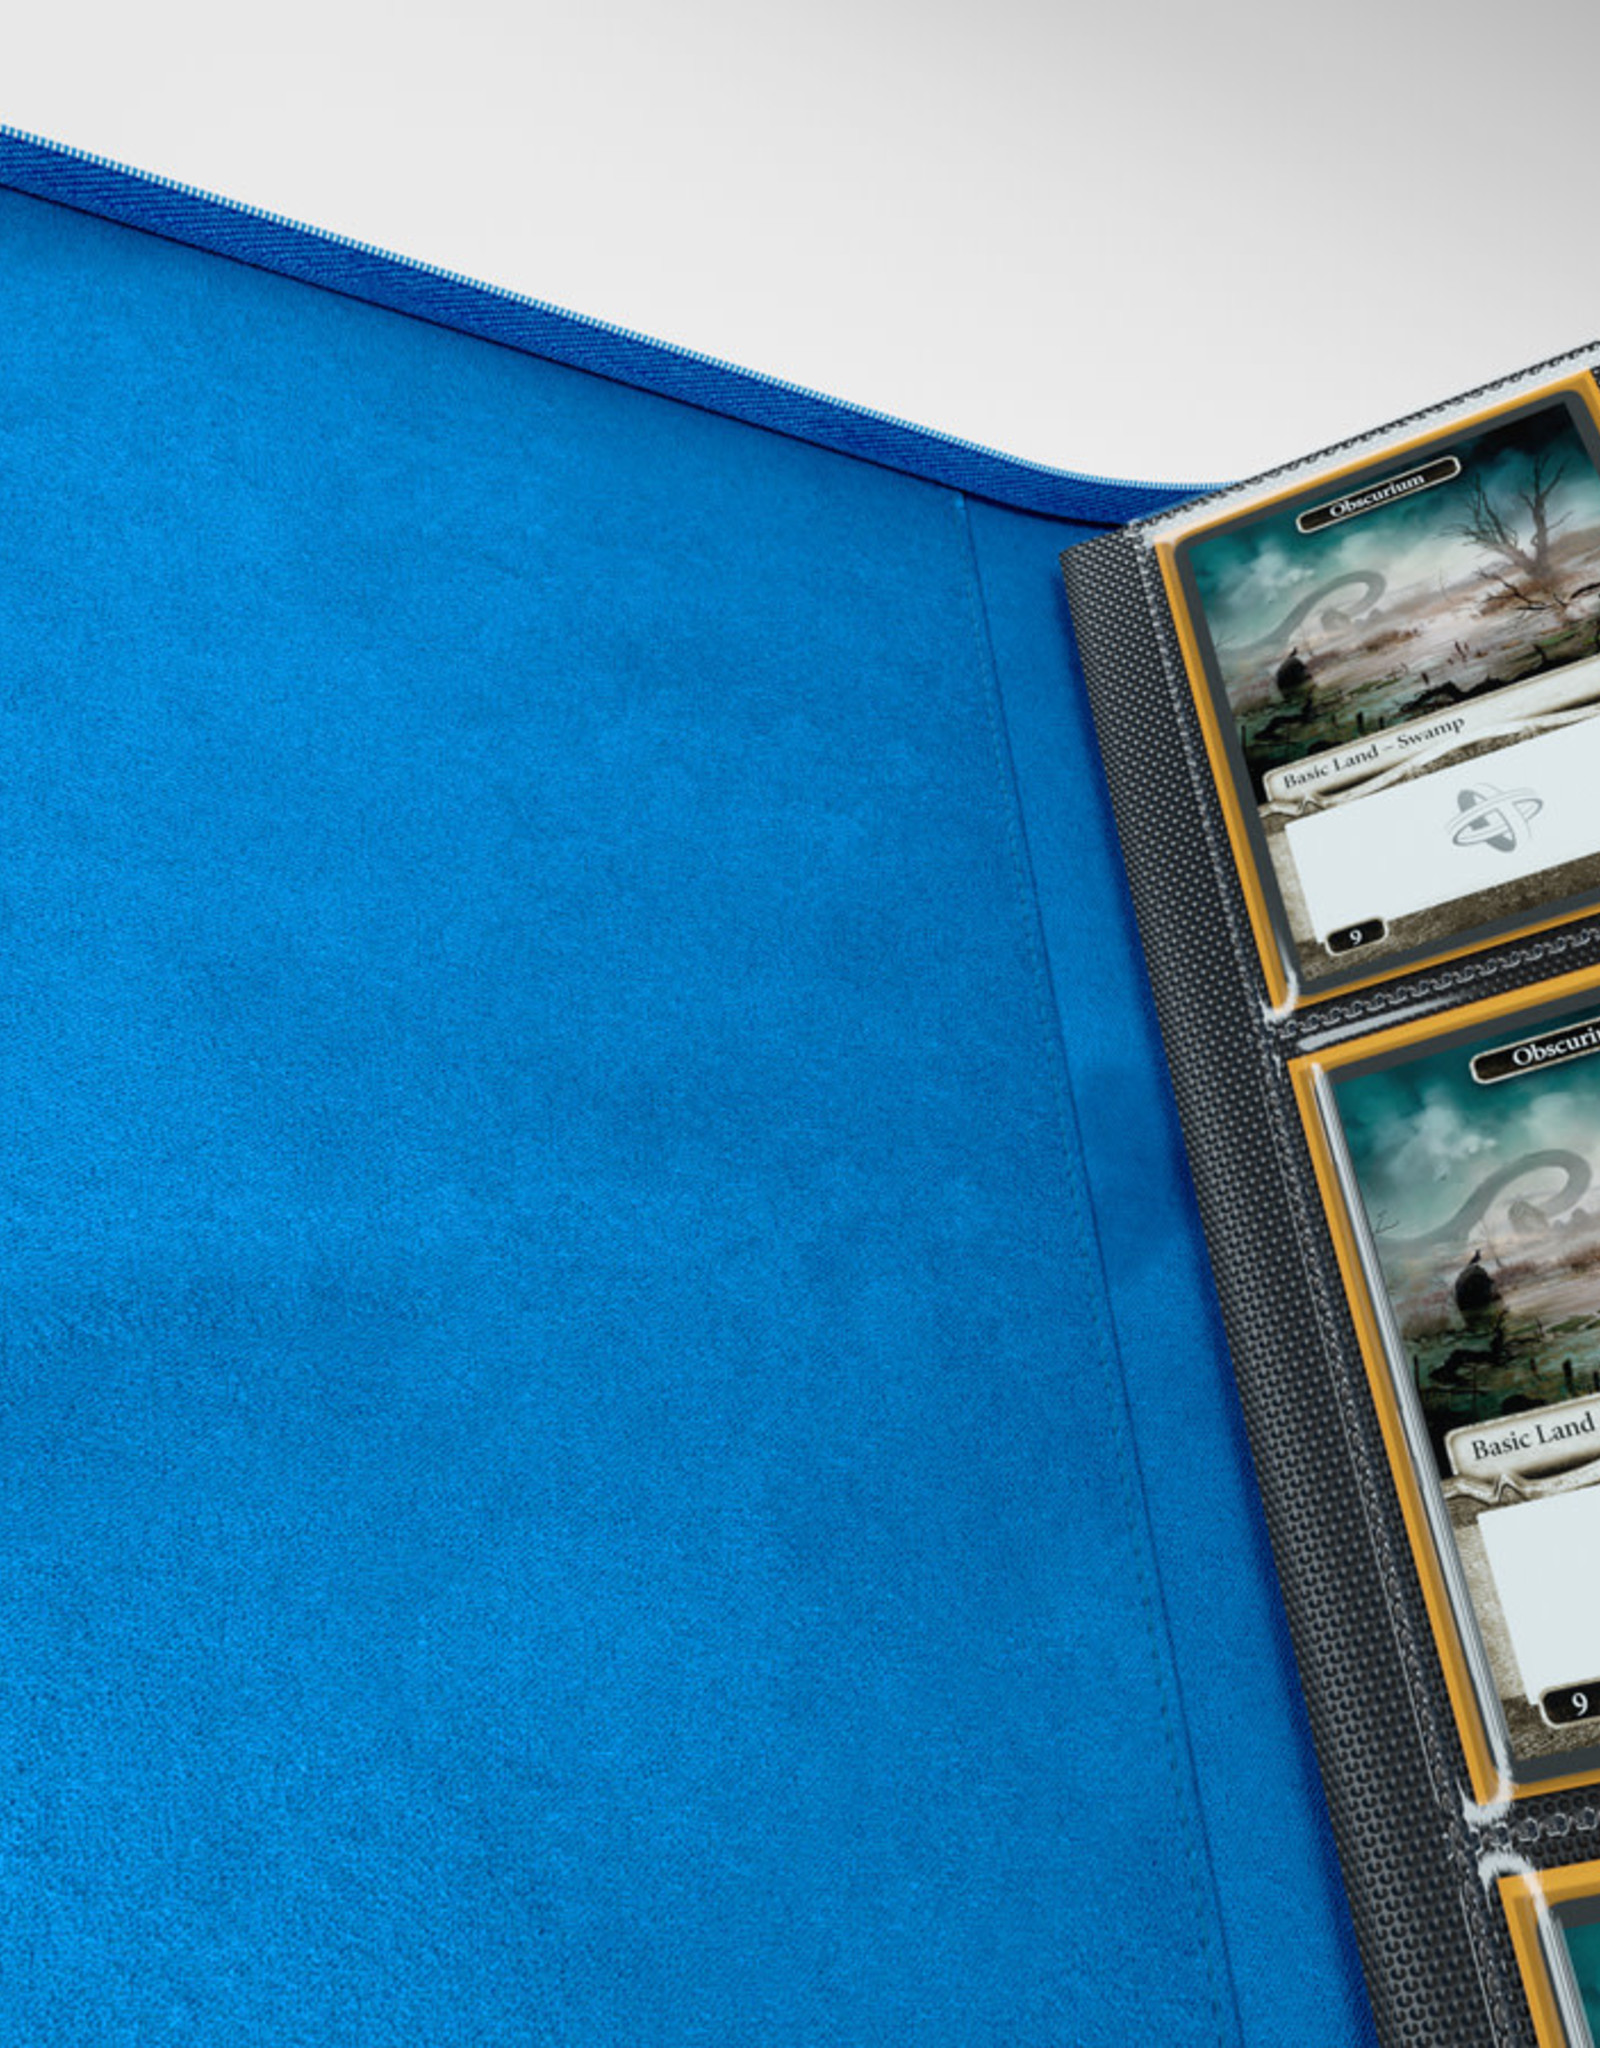 Binder: 8-Pocket Zip-Up Album Blue